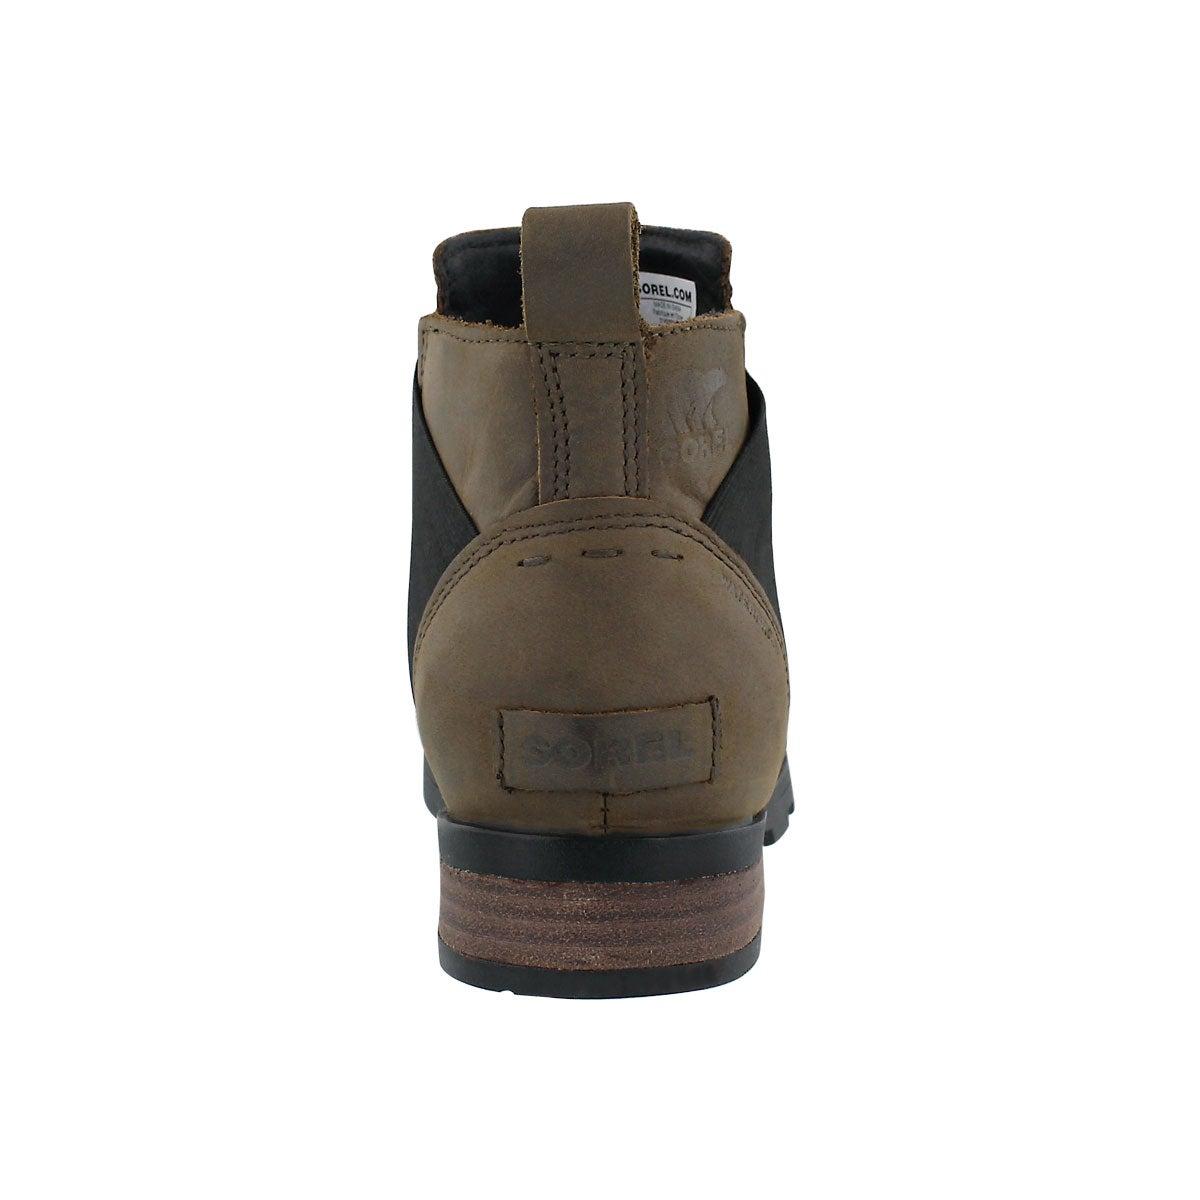 Lds Emelie major/blk wtpf chelsea boot